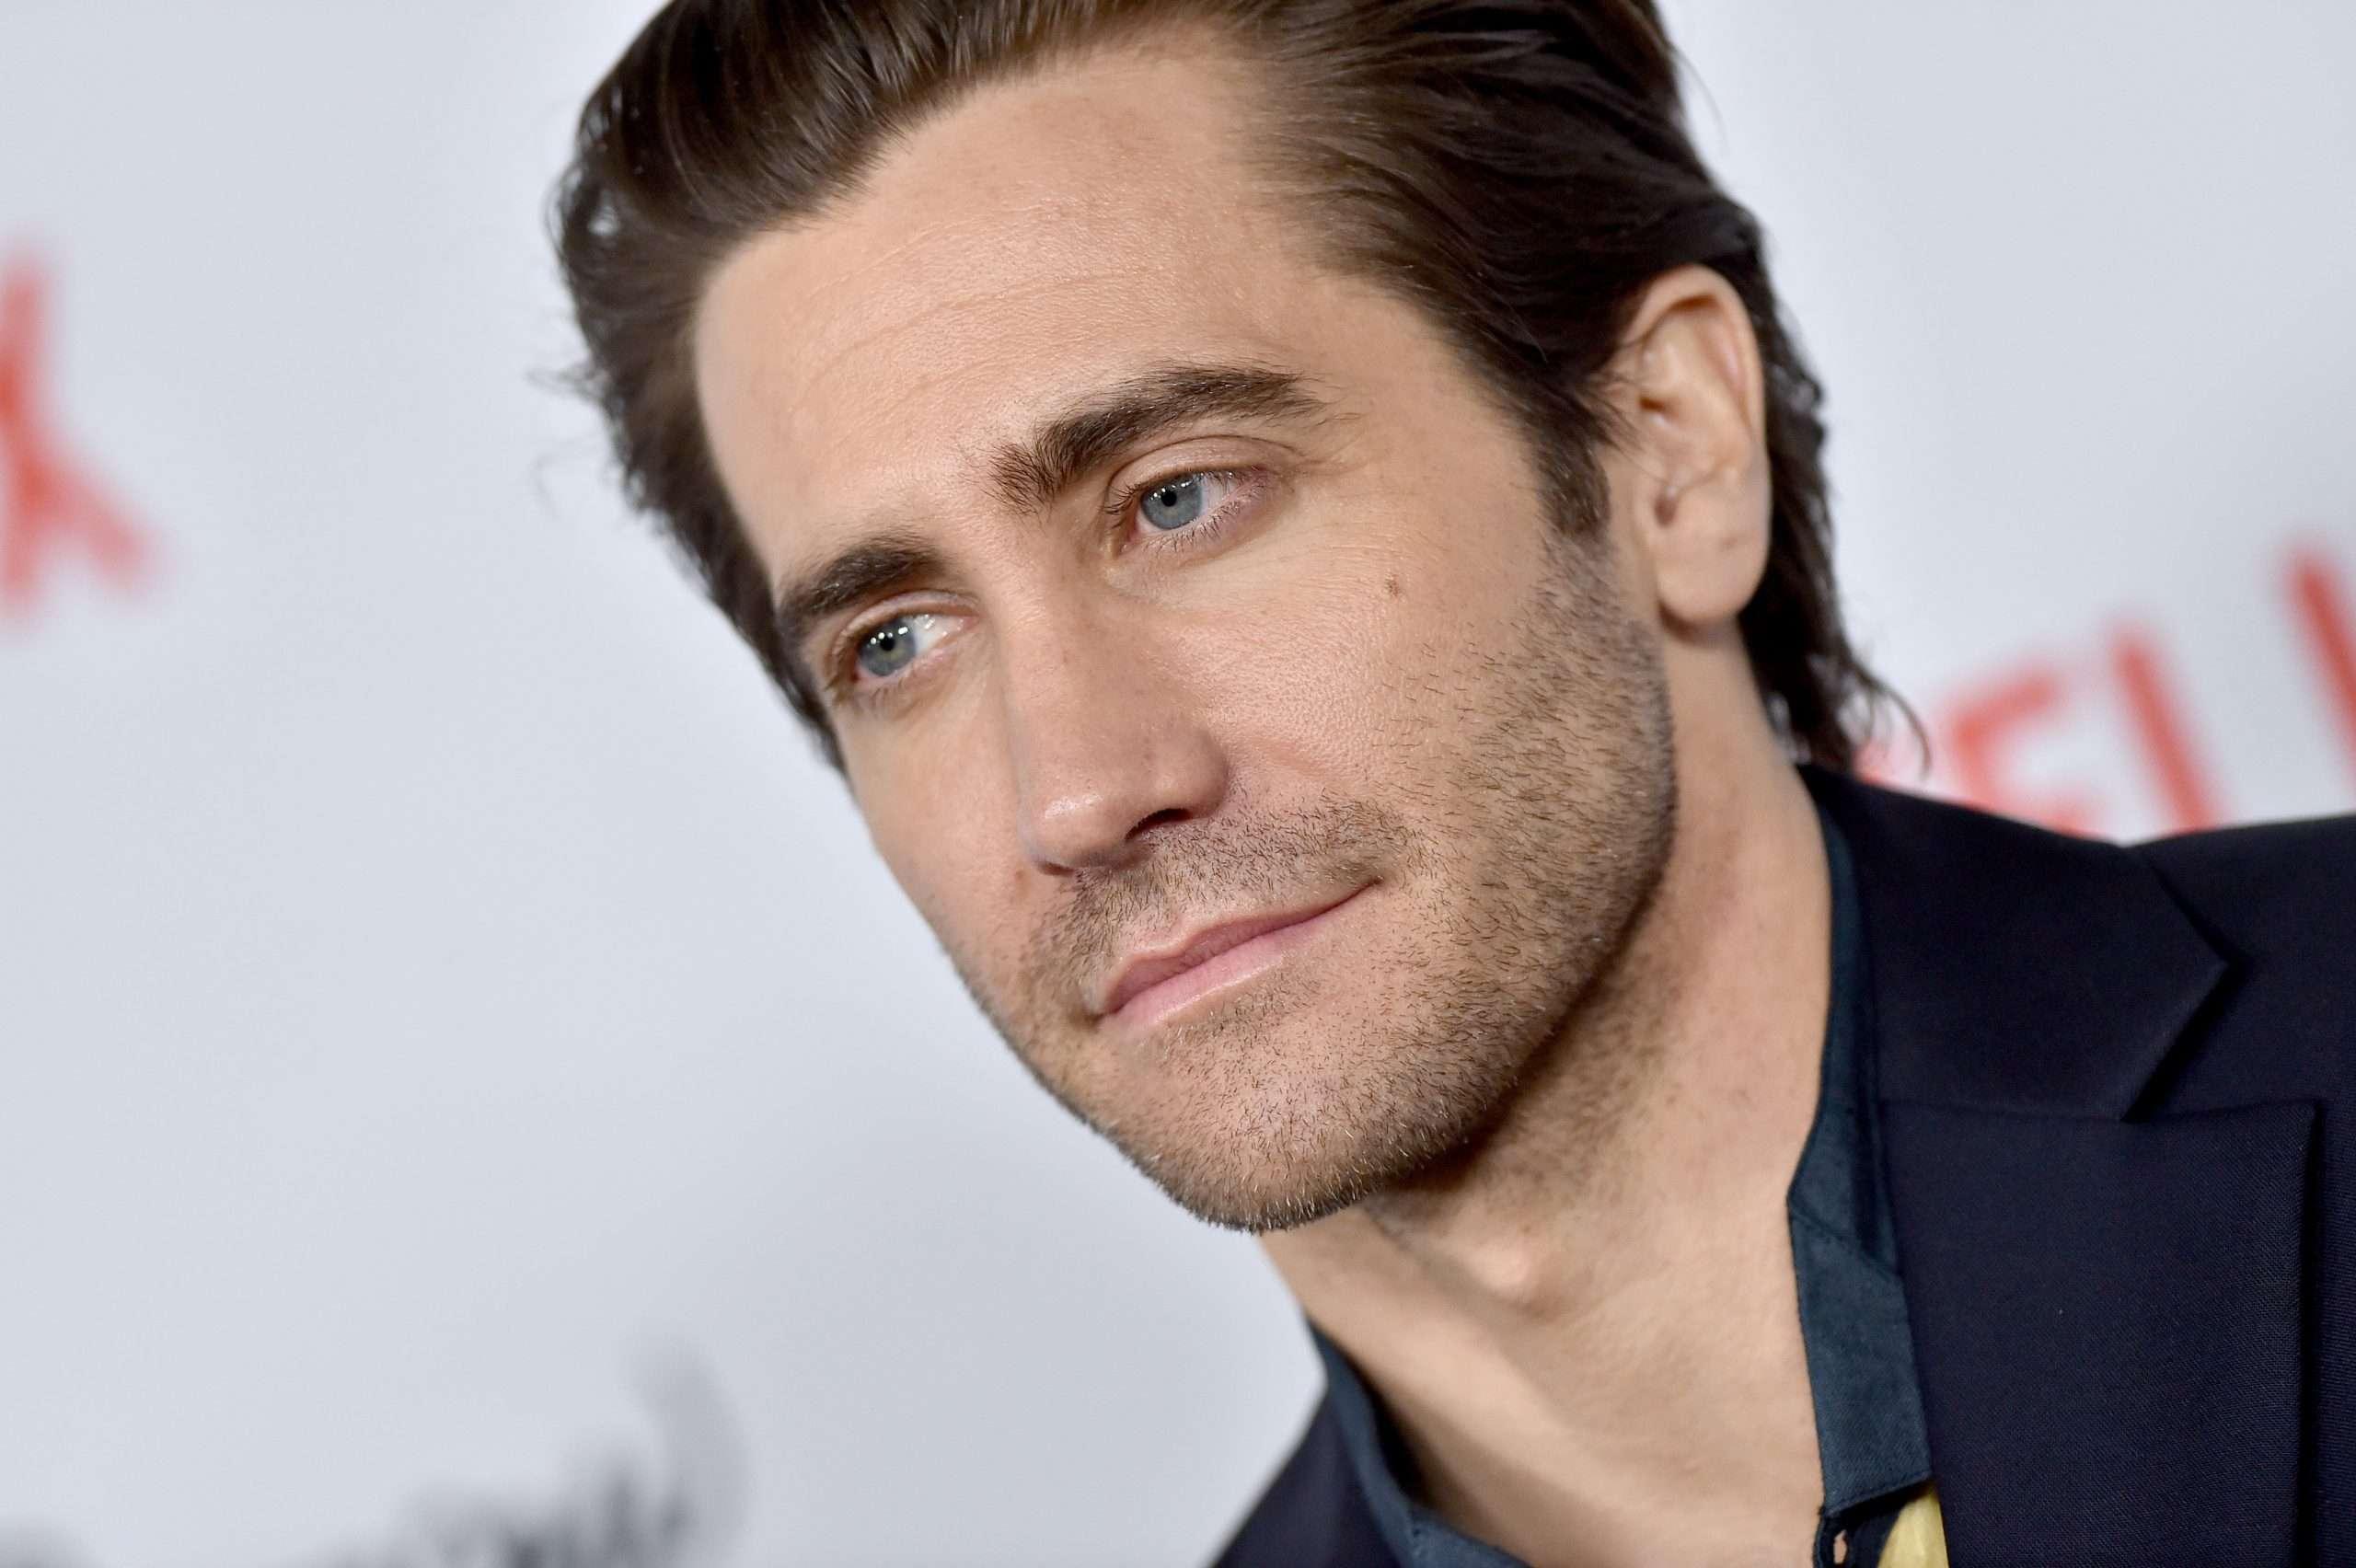 Jake-Gyllenhaal-1-scaled.jpg